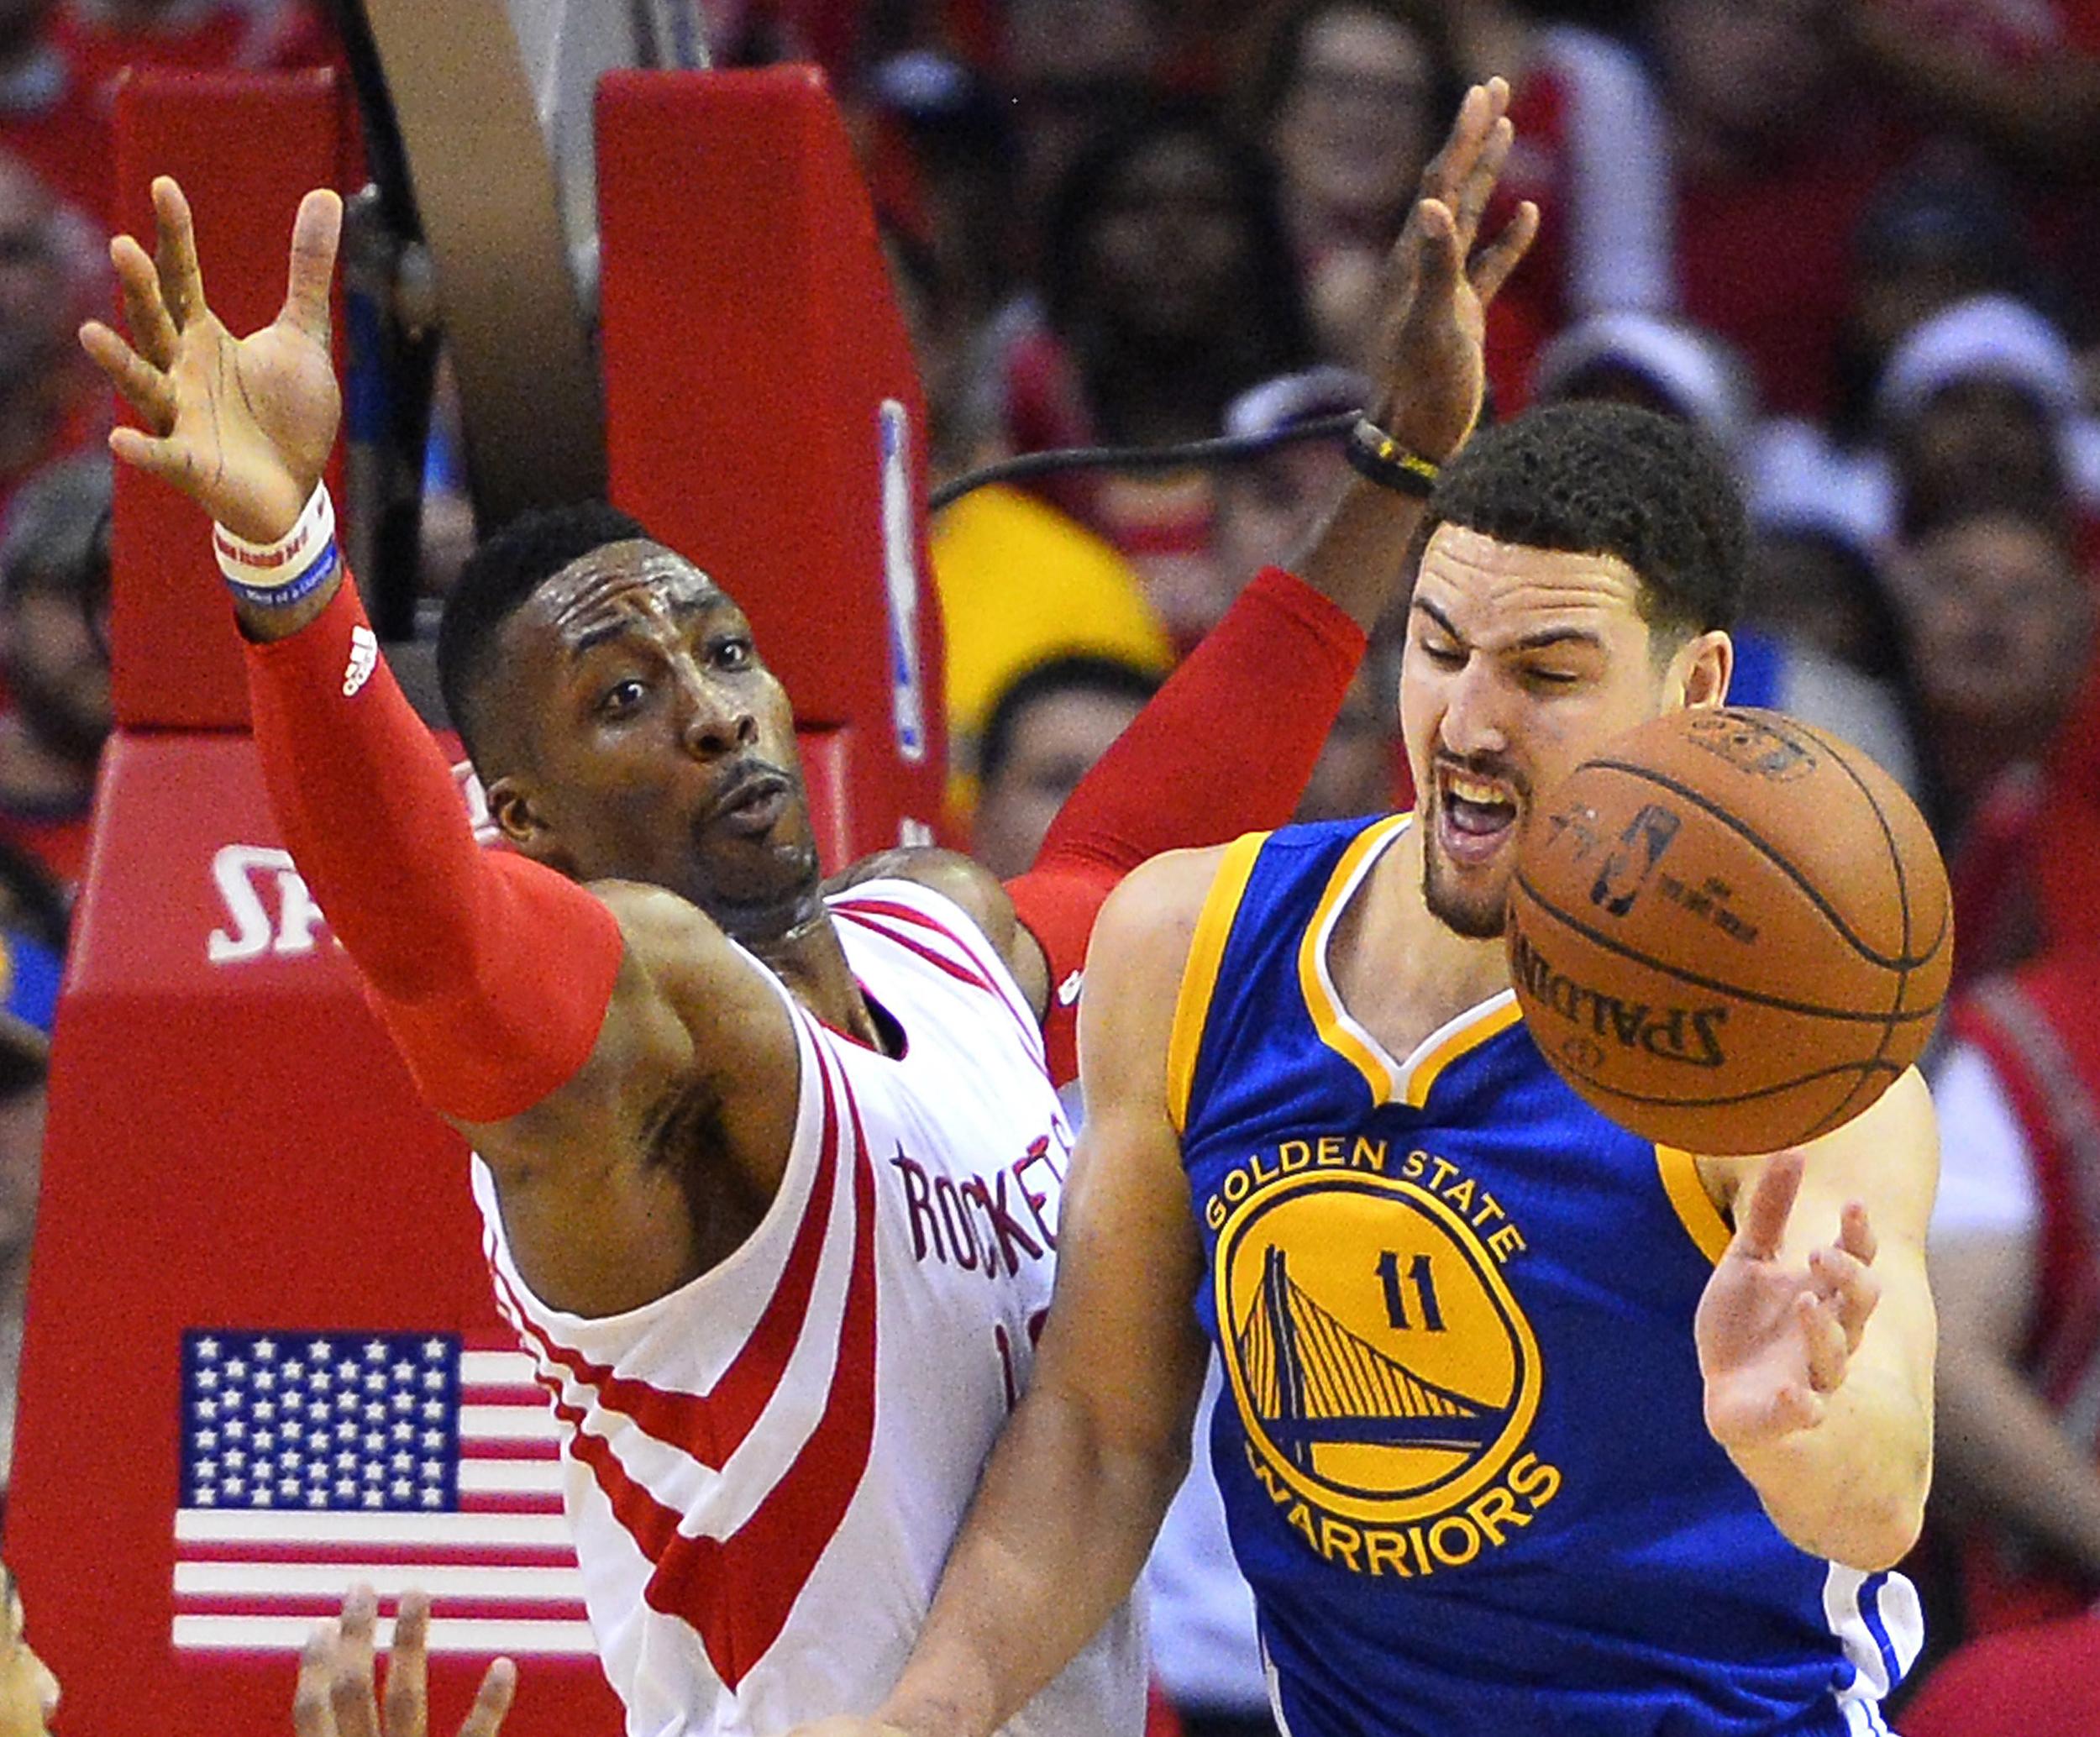 Overtime: Flooding Strands Houston Rockets Fans in Arena